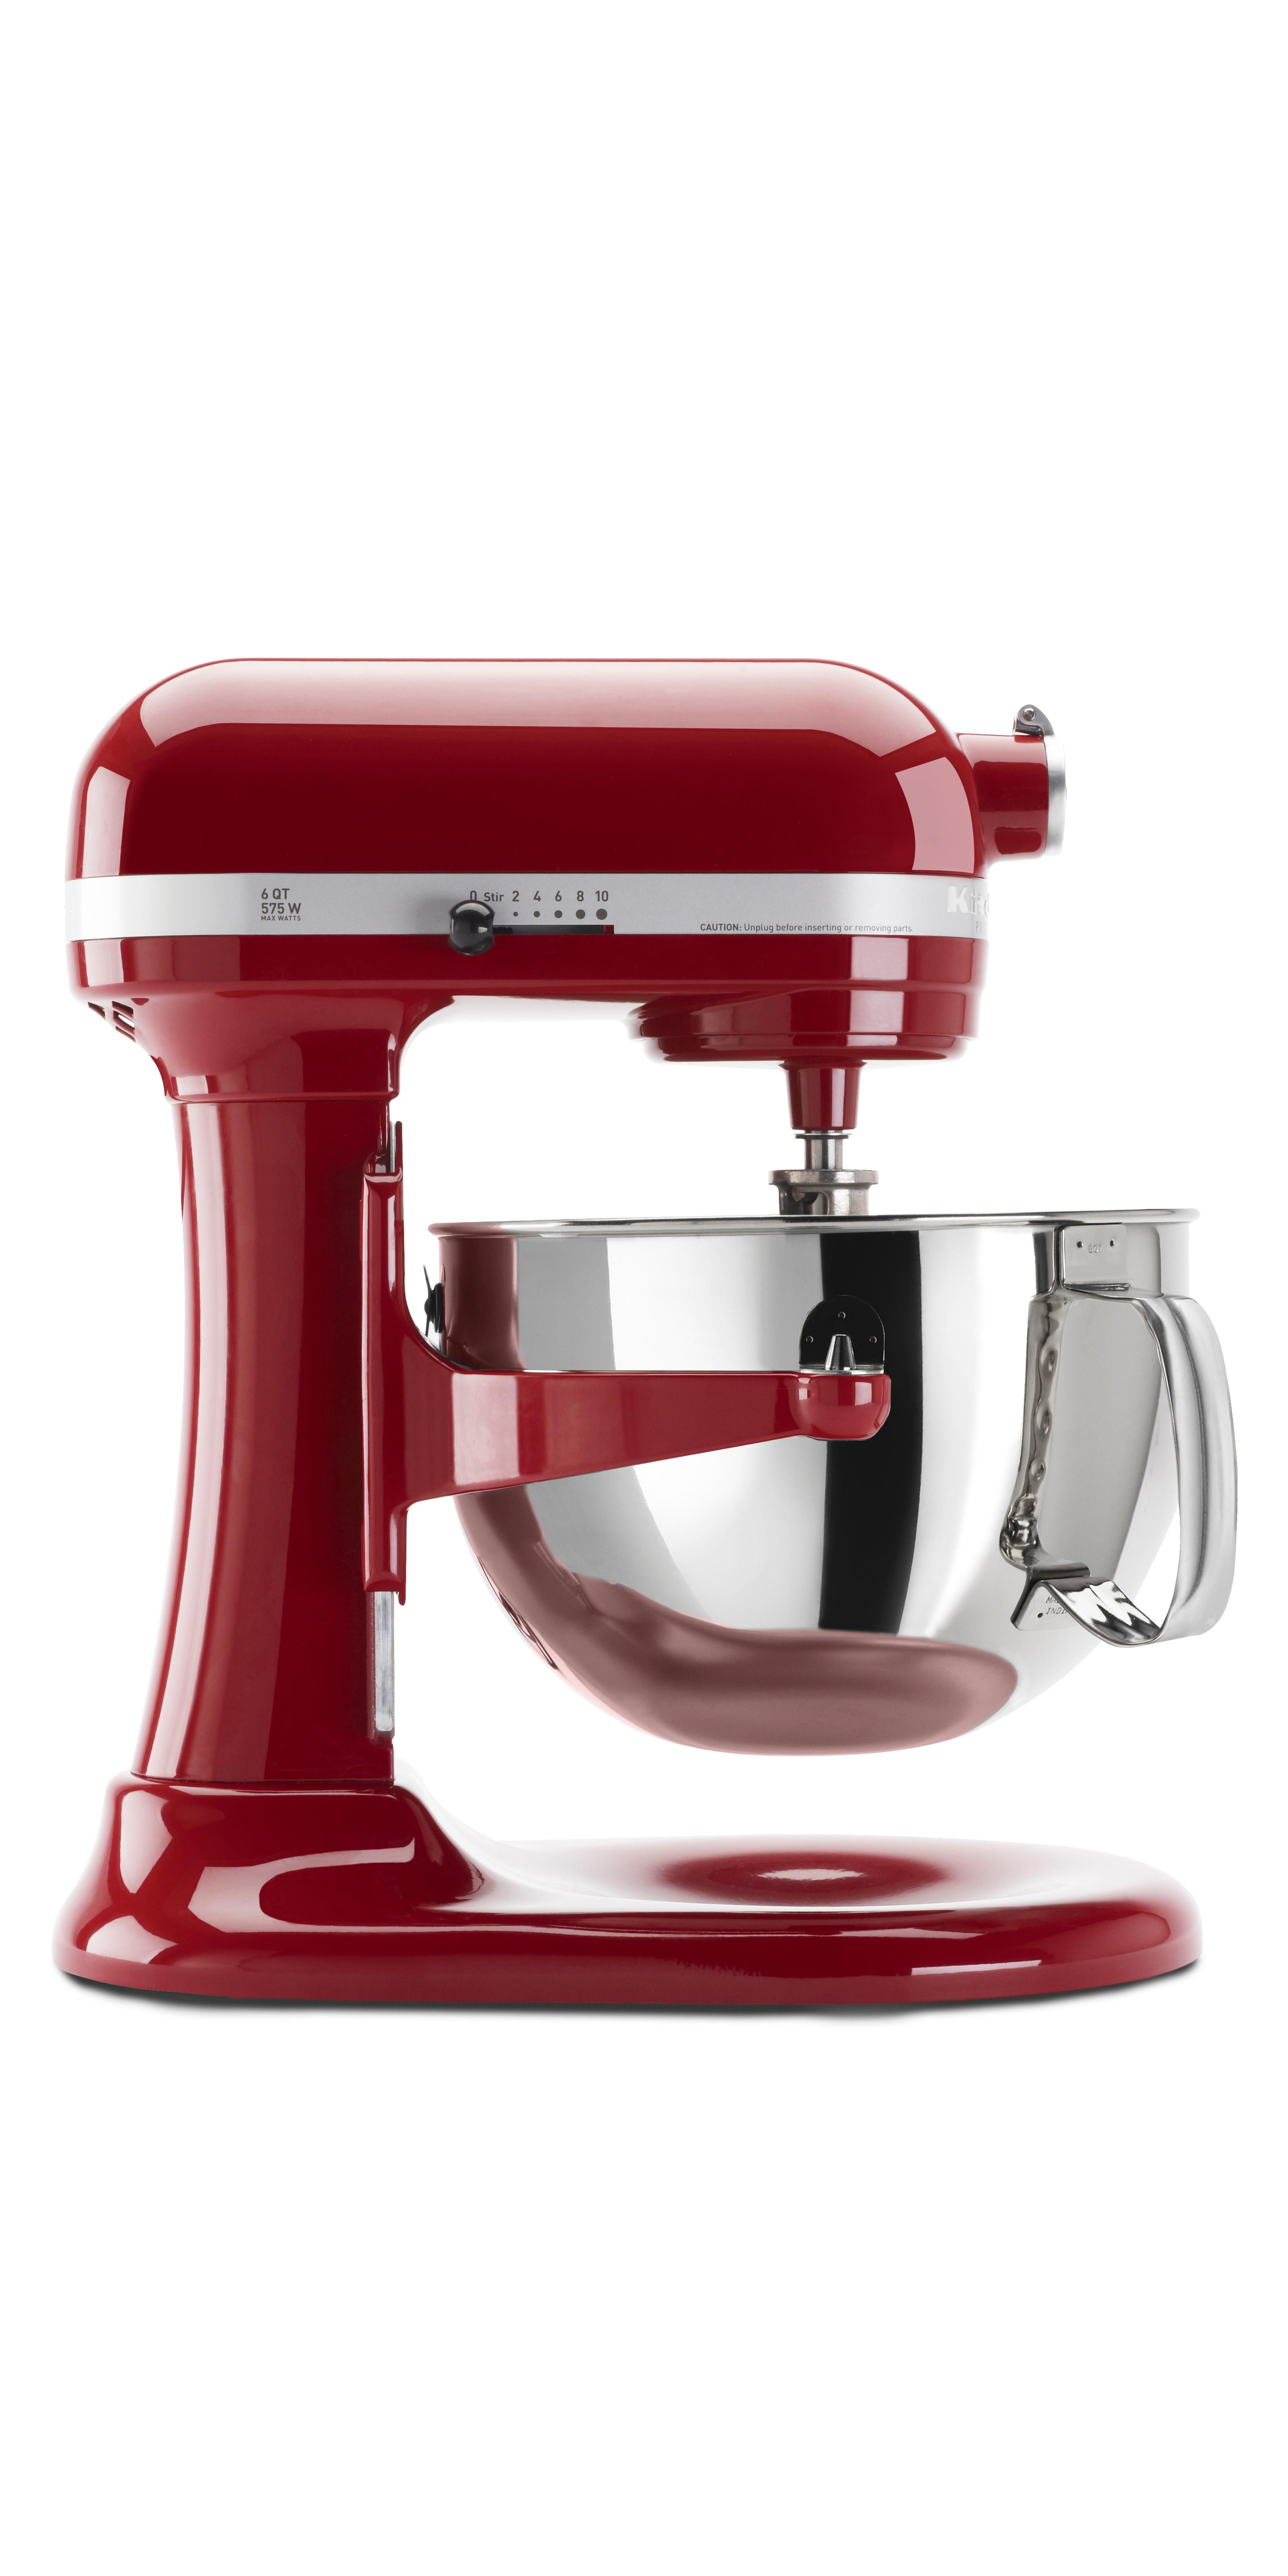 Amazon.com: KitchenAid KSM150PSER 5-Qt. Artisan Series with Pouring Shield -